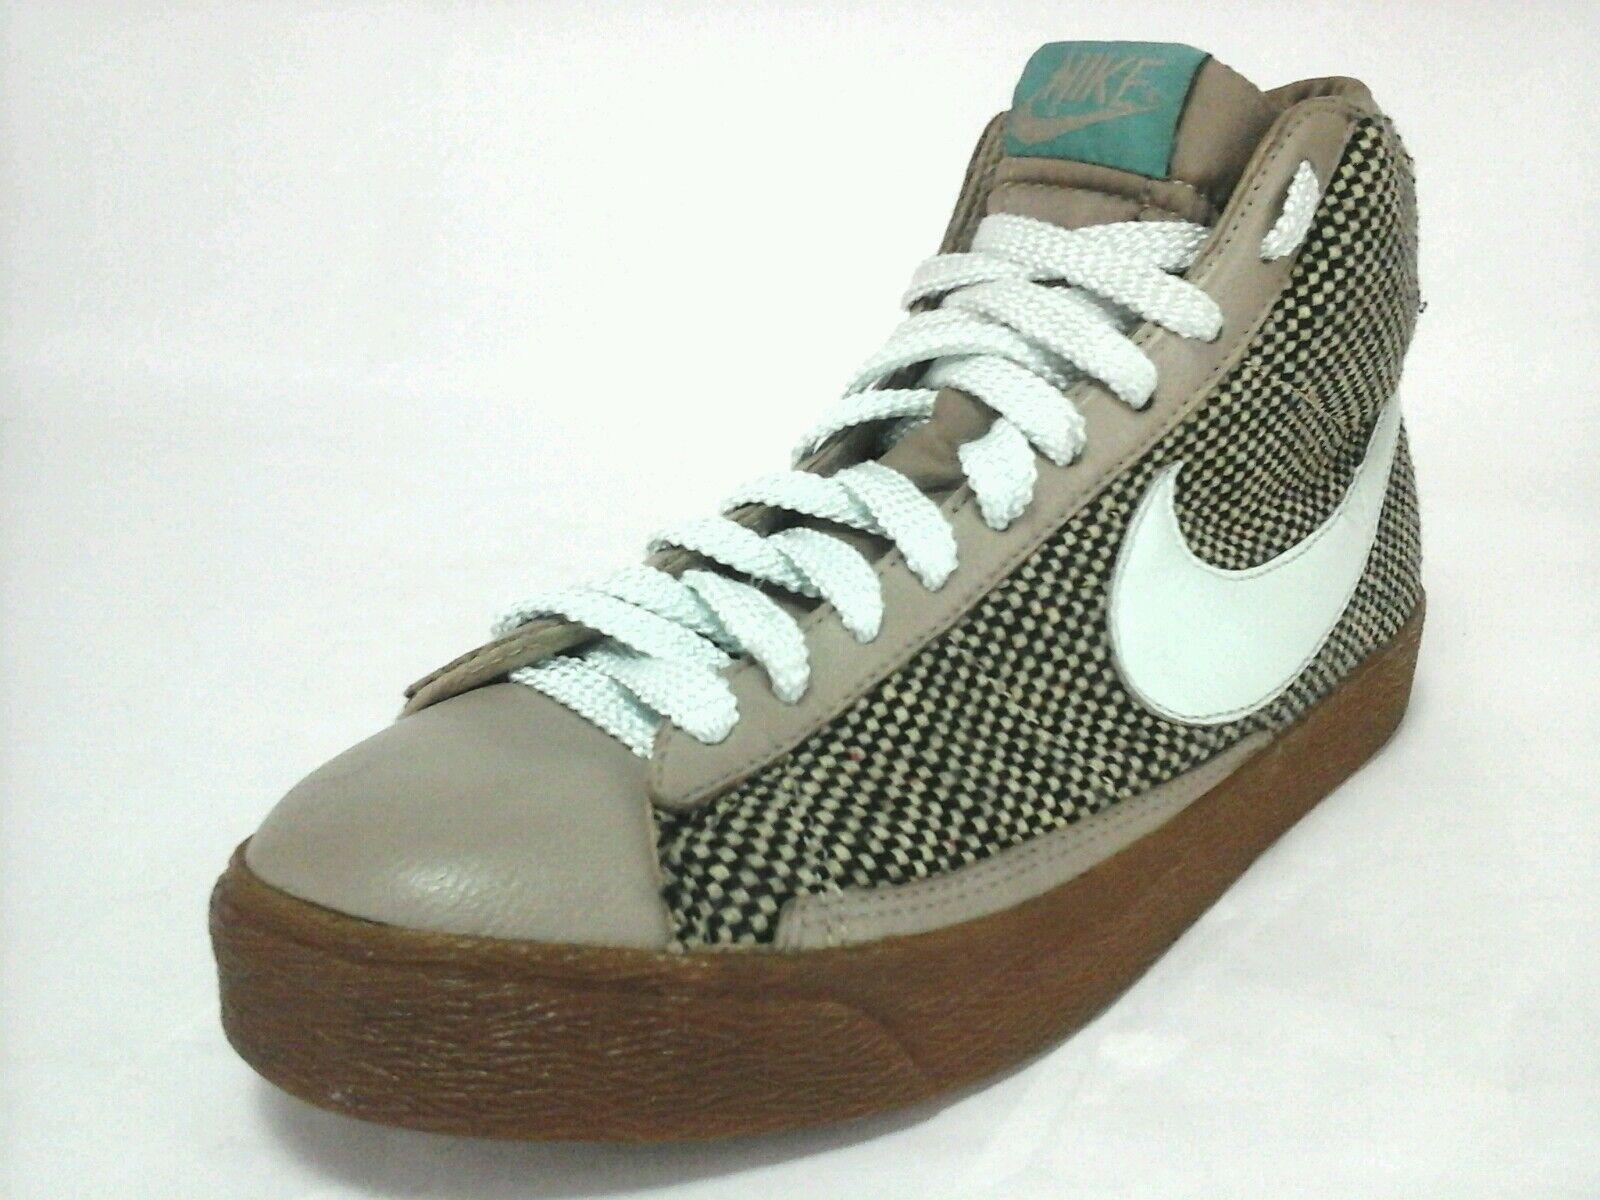 Le scarpe nike alte tweed marrone / verde Uomota 2005 gomma solo scarpe da ginnastica / 41 rare